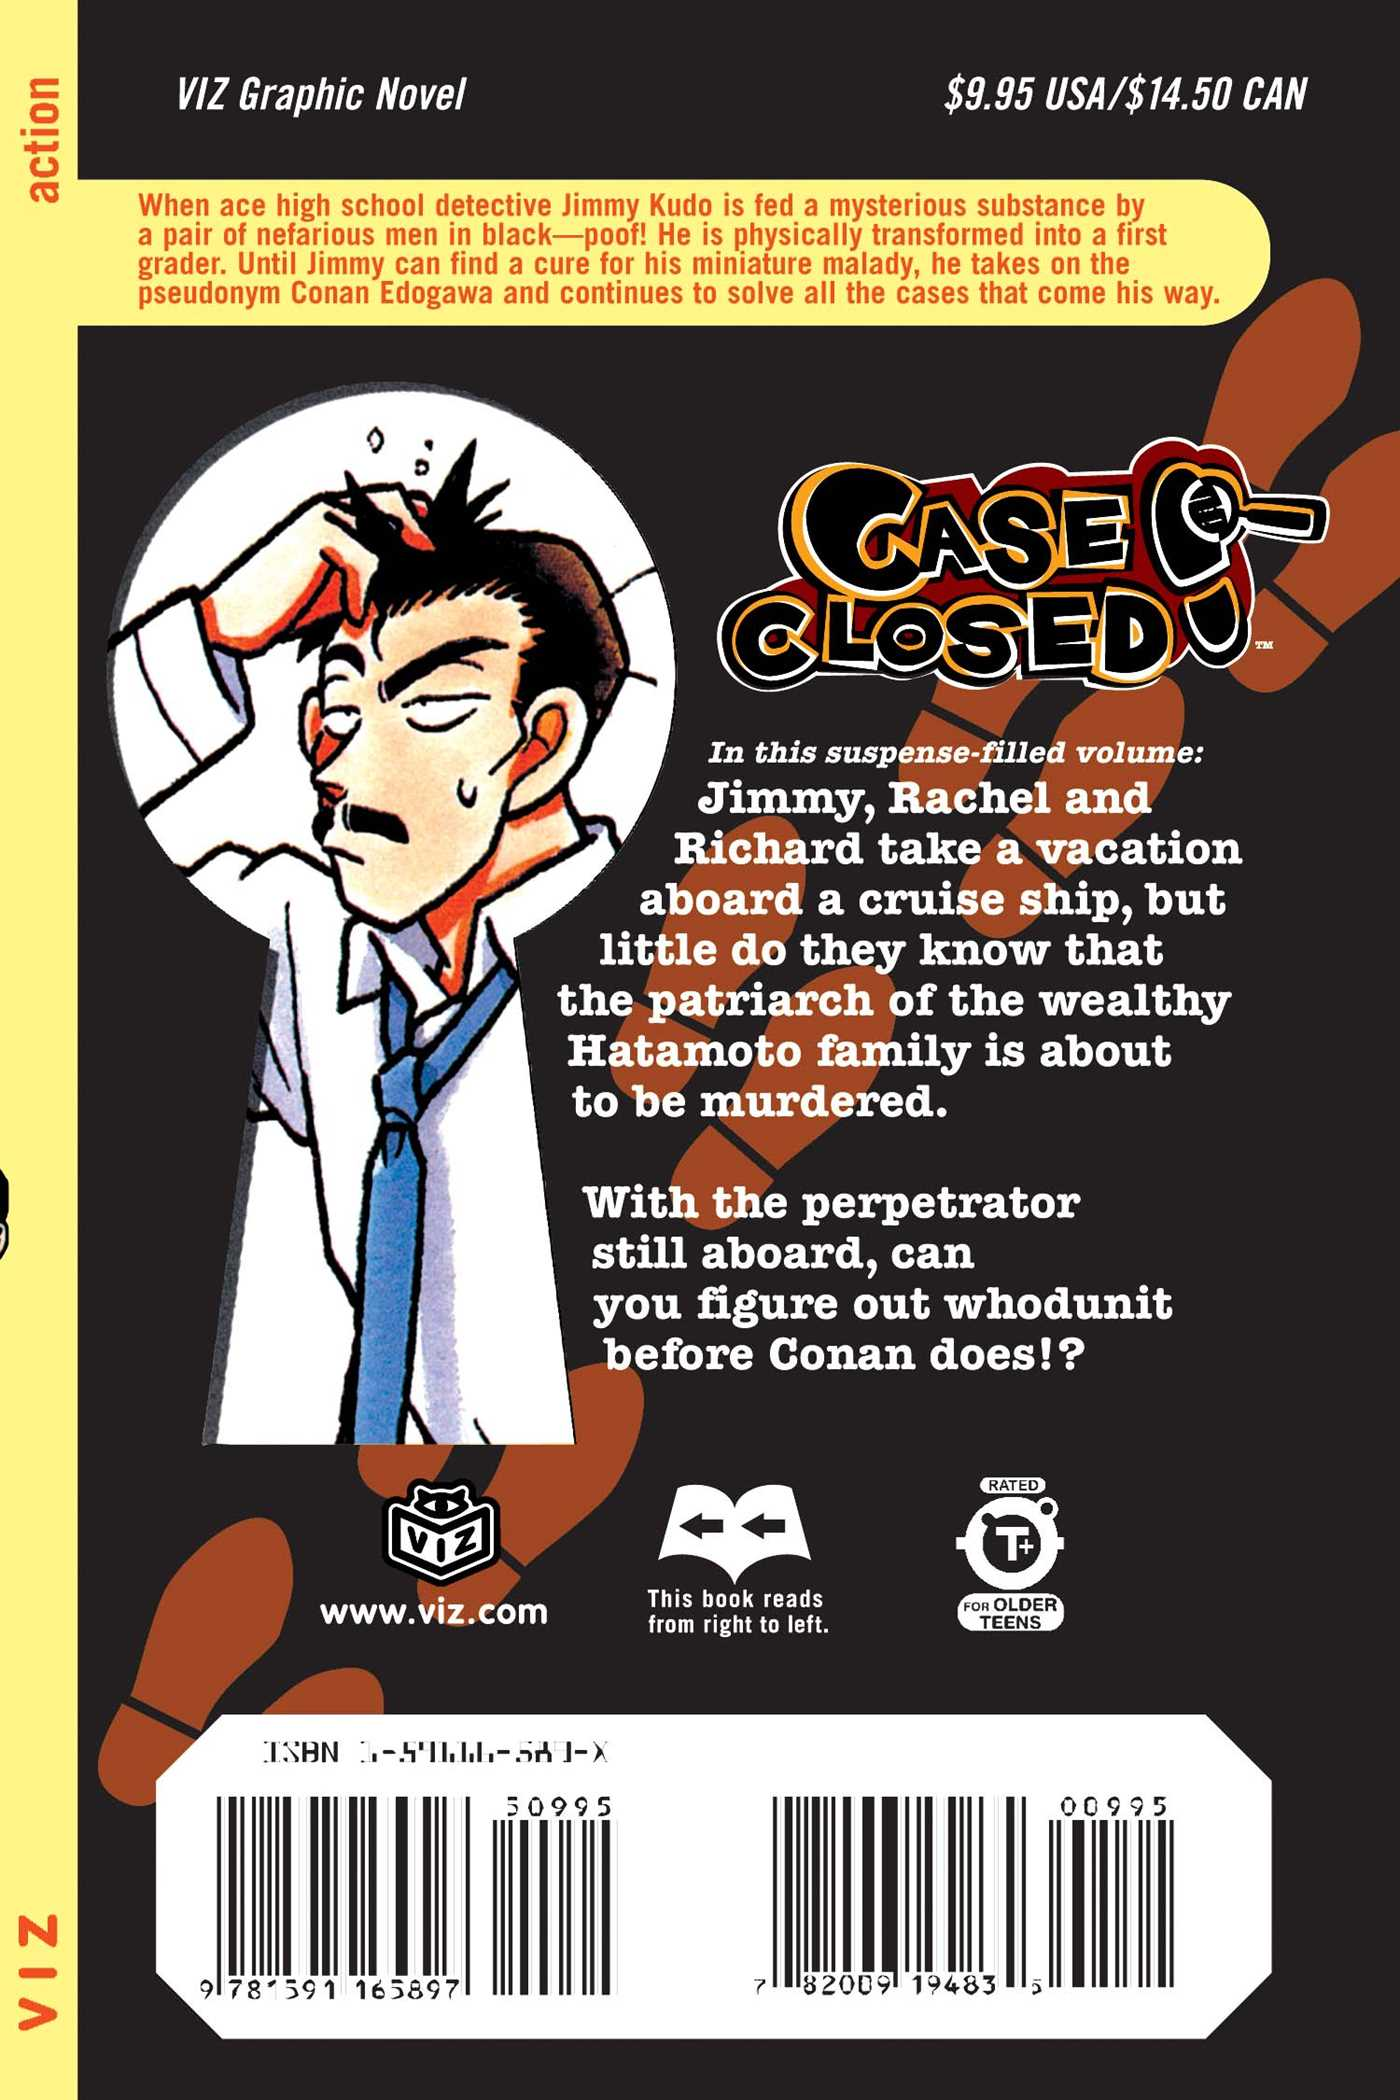 Case closed vol 3 9781591165897 hr back